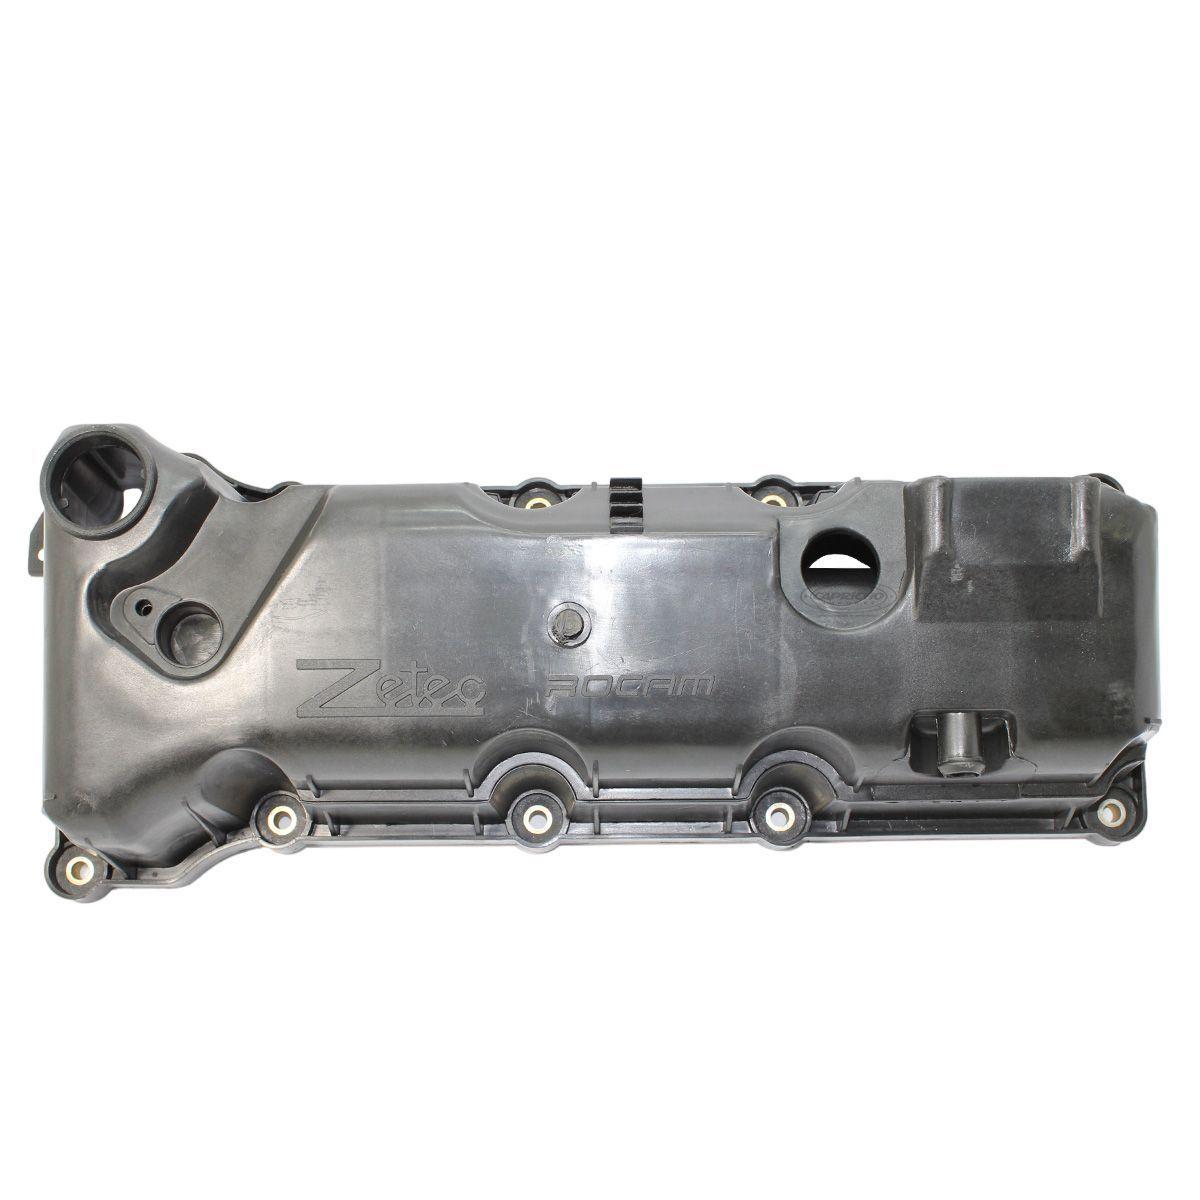 Tampa de válvulas - Ford Ka / Fiesta / Focus - Motor Zetec Rocam - Gasolina